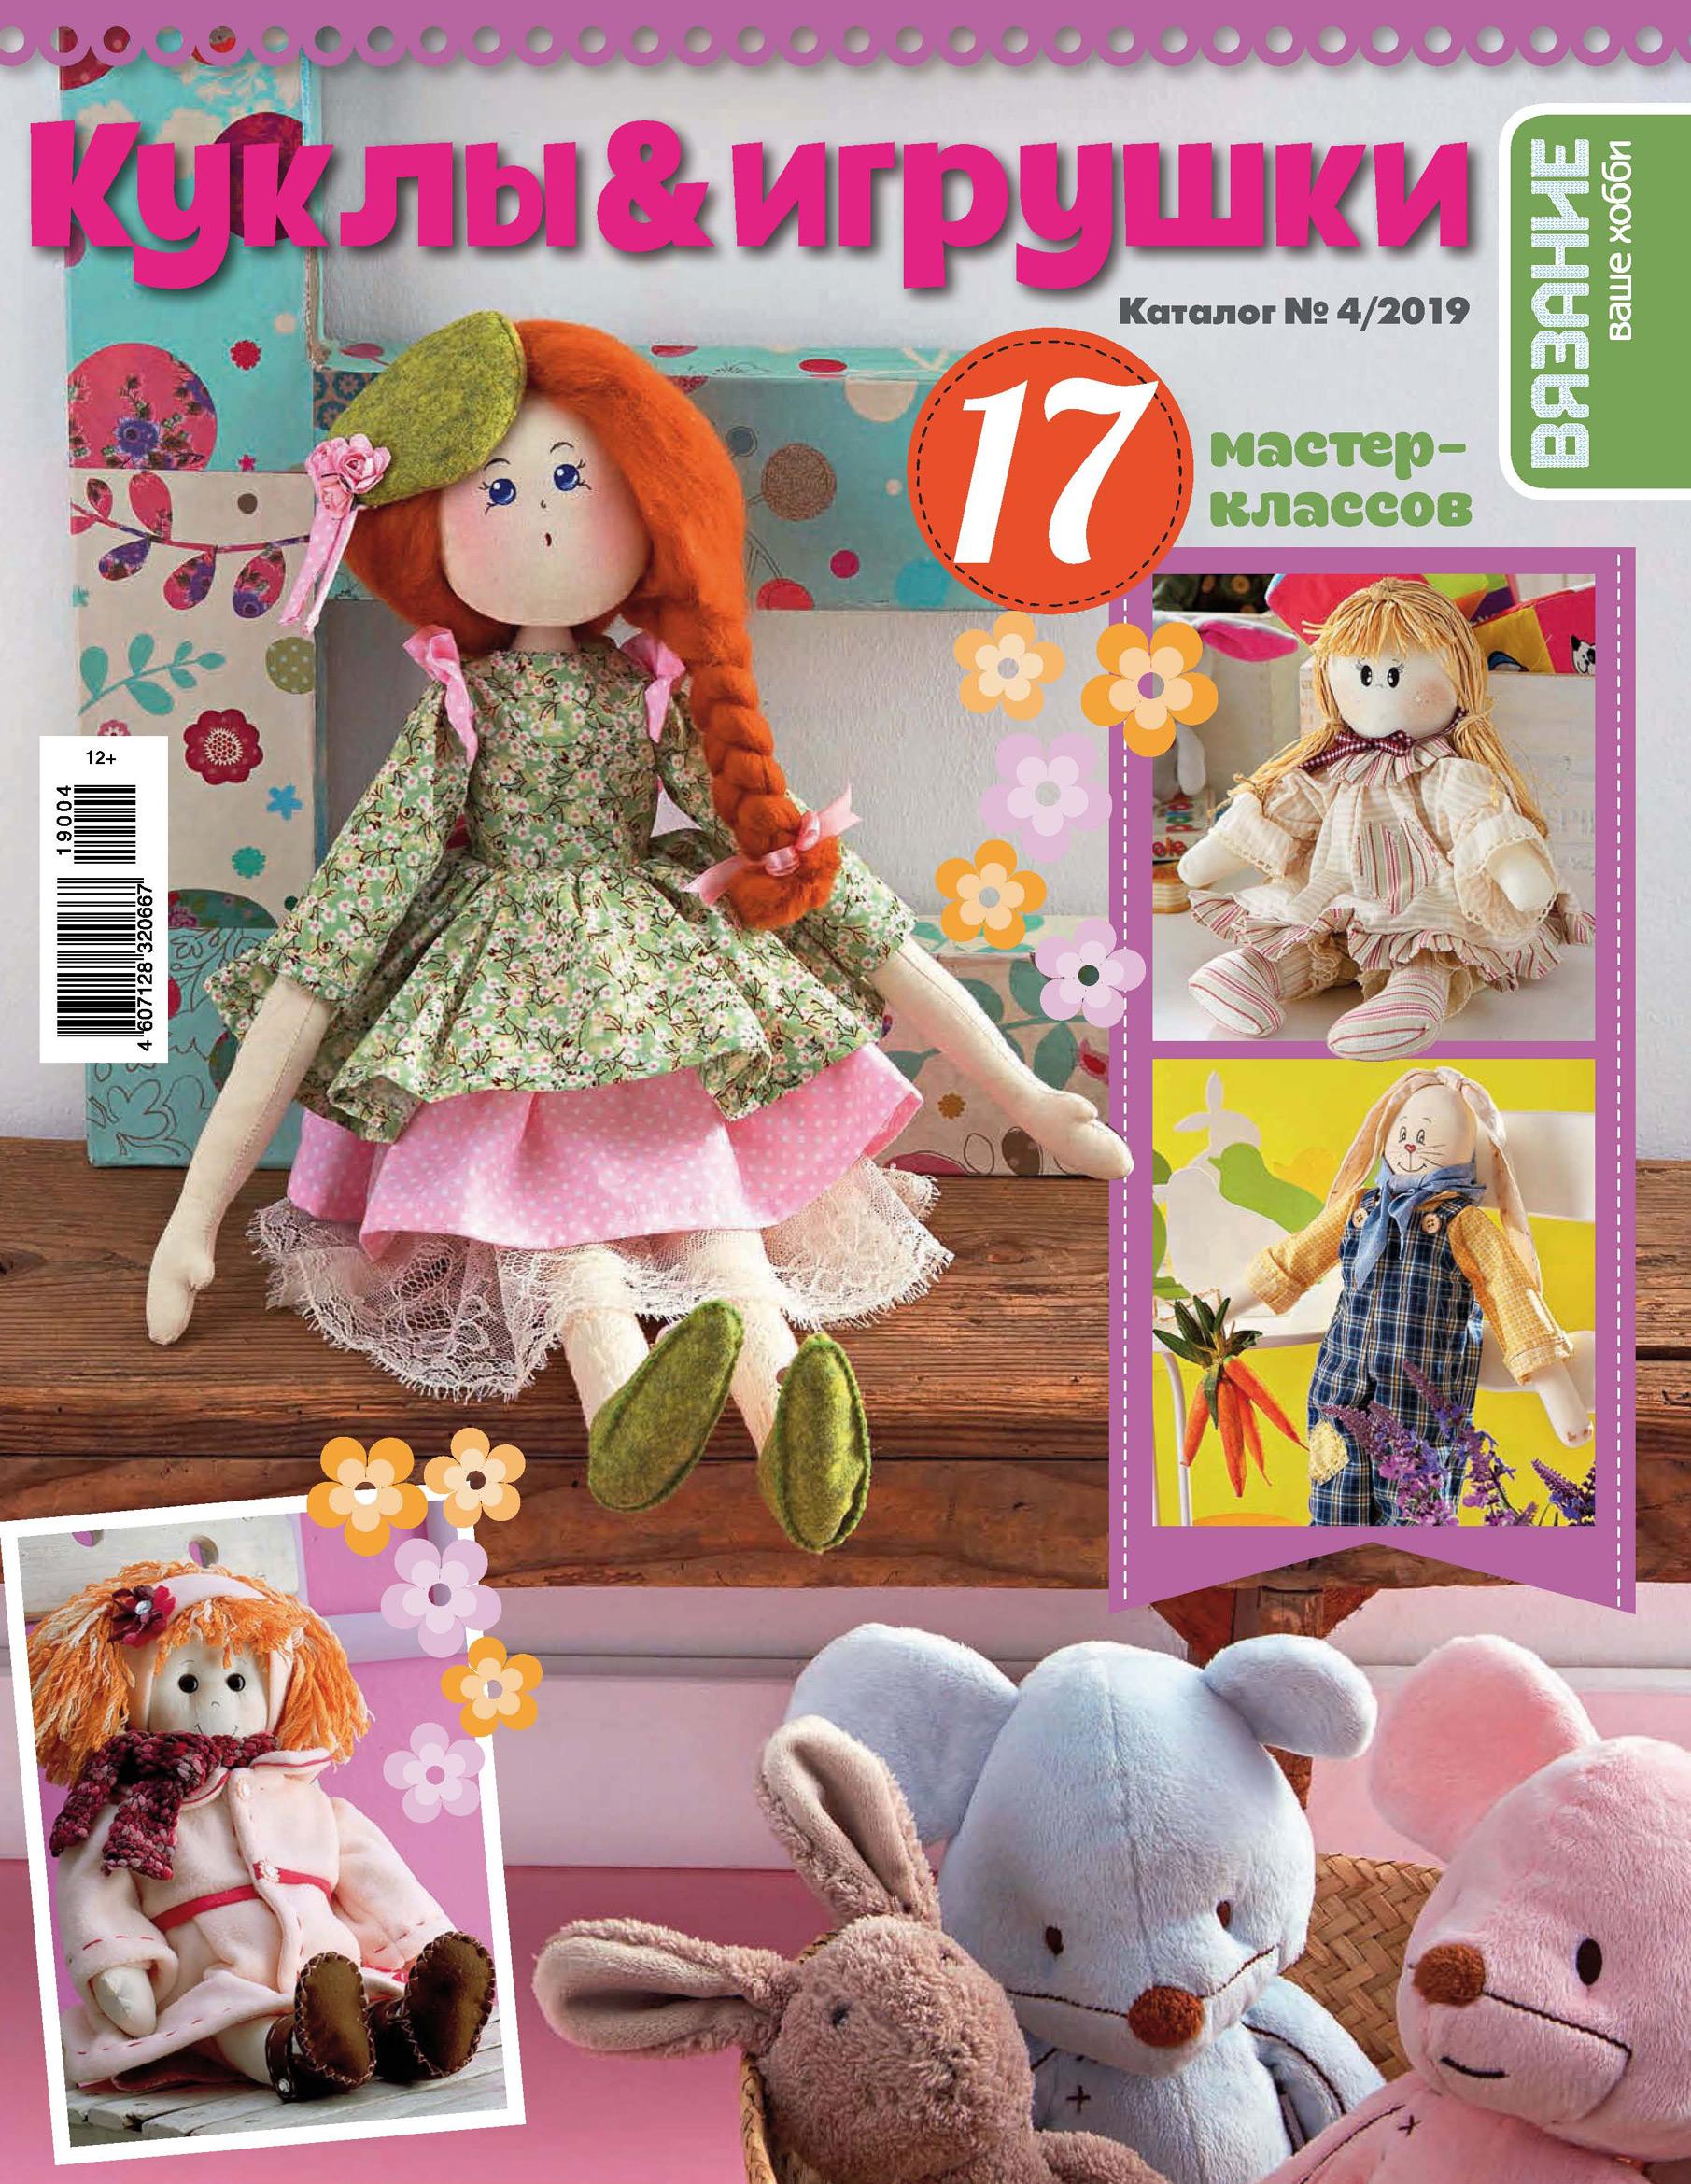 Вязание – ваше хобби. Каталог №4/2019. Куклы и игрушки